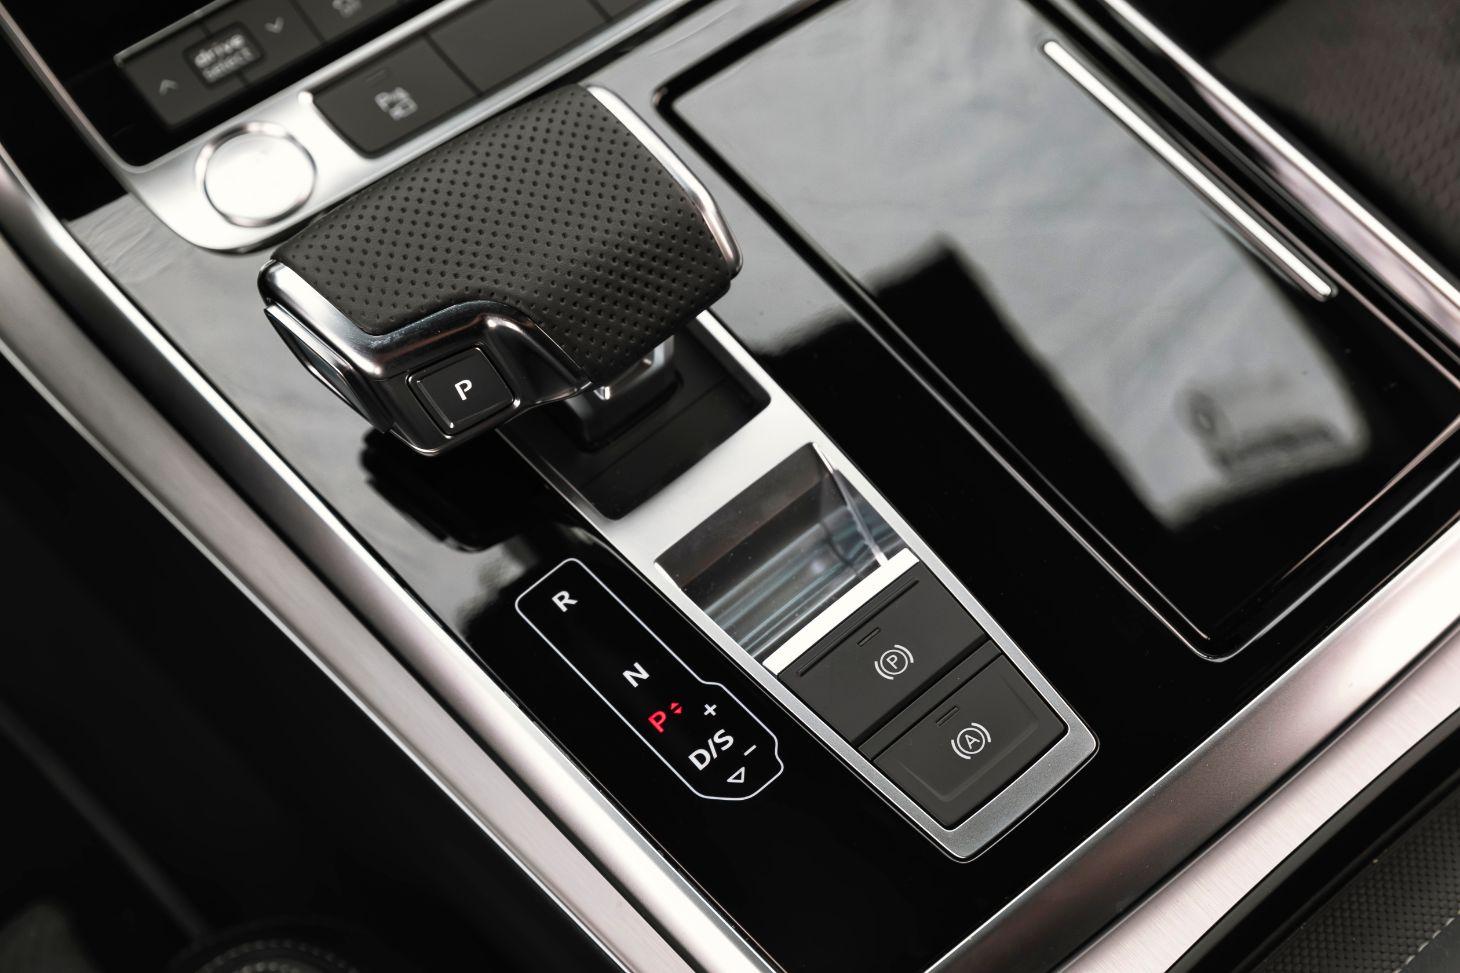 cambio automatico de 8 velocidades do audi q7 2021